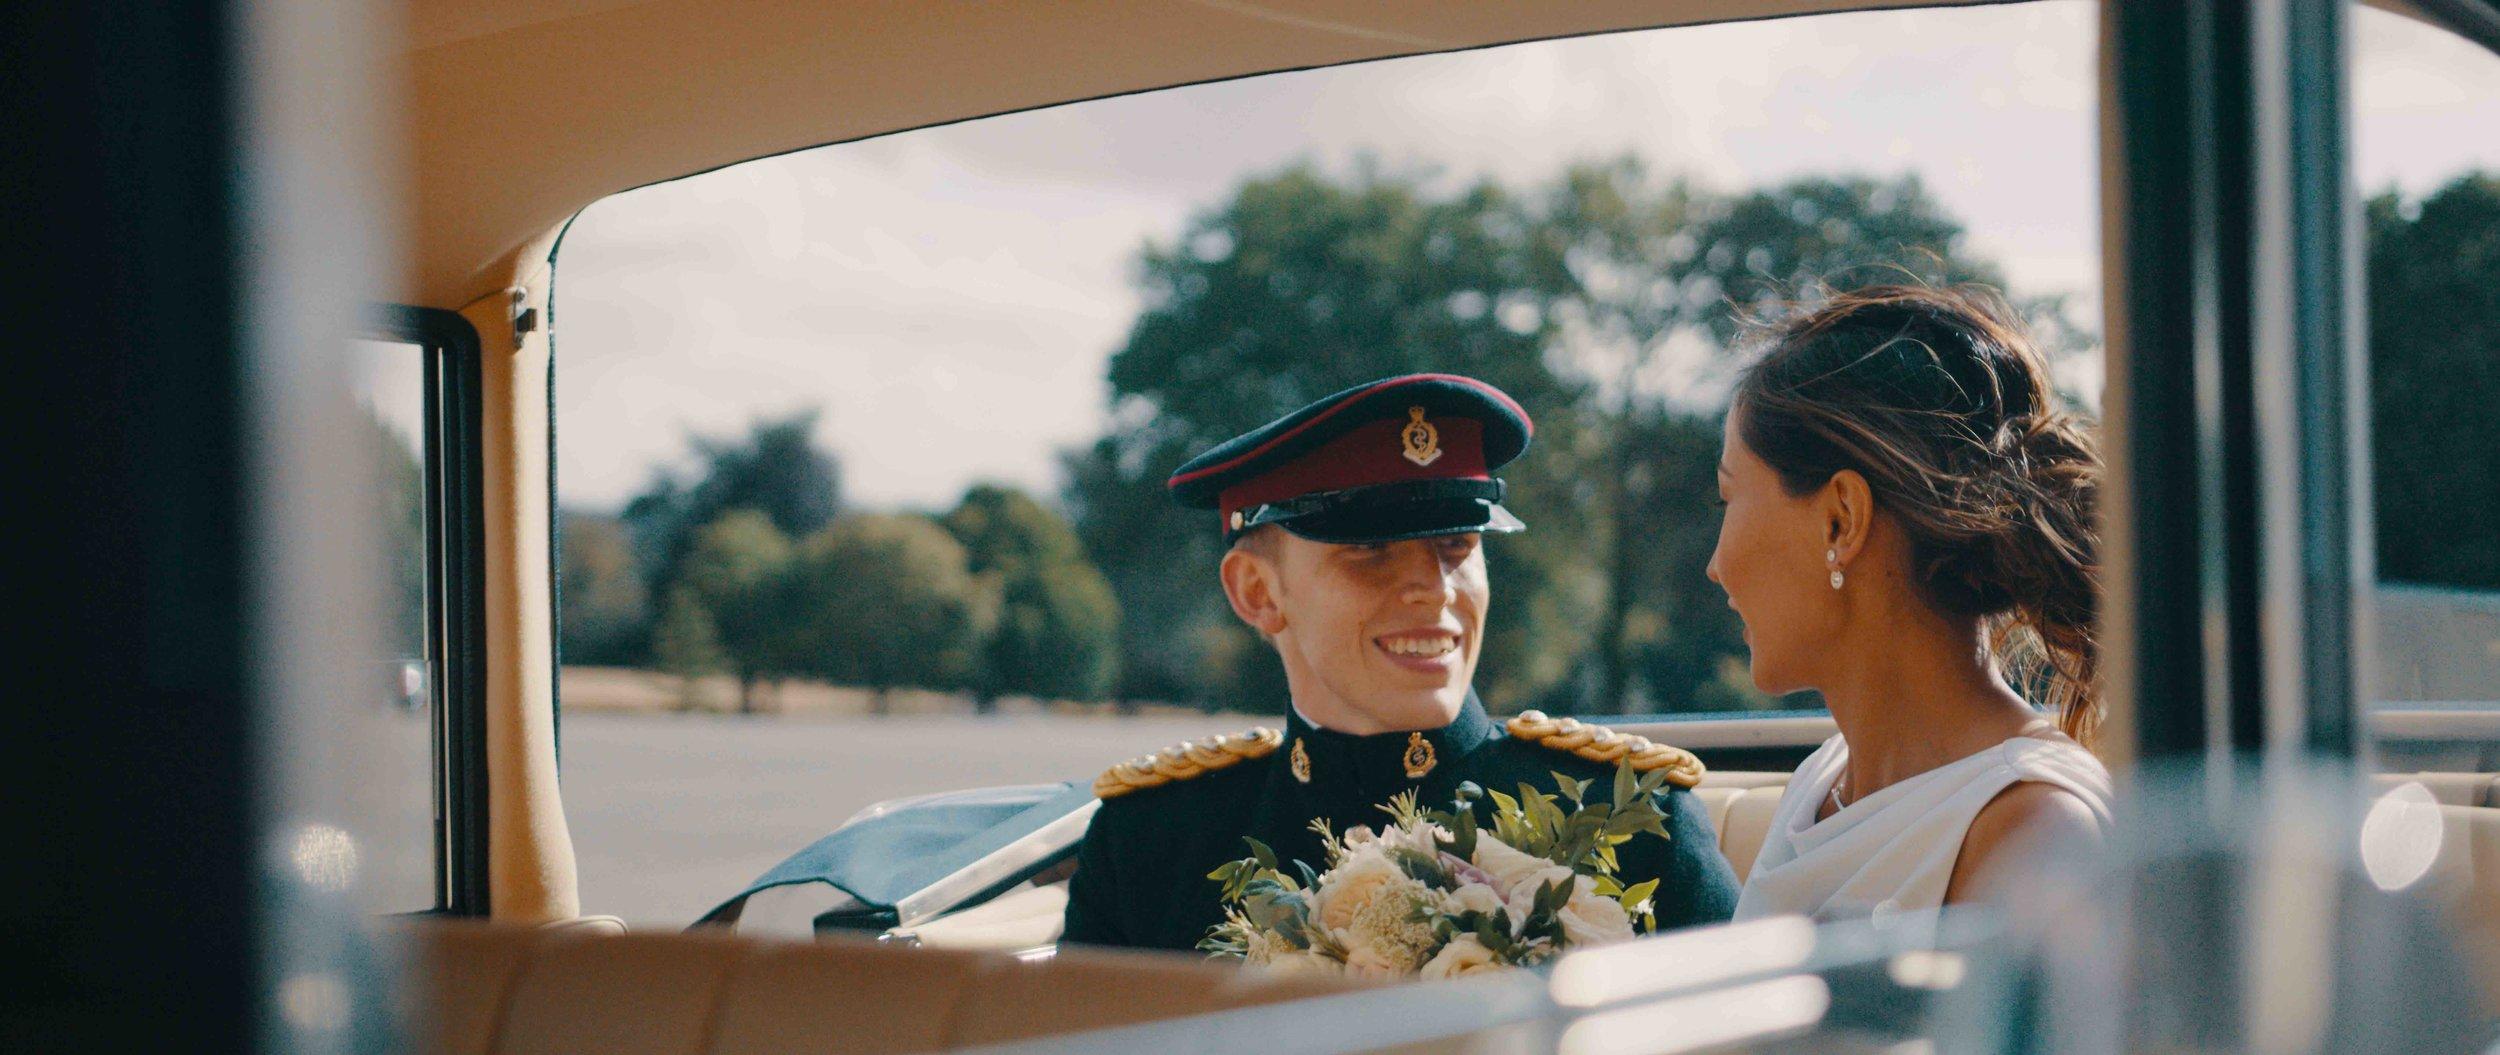 + 495€ | Vidéografo extra - Para bodas grandes, un camarógrafo adicional puede ser la mejor opción para asegurarse de que se capture cada momento.